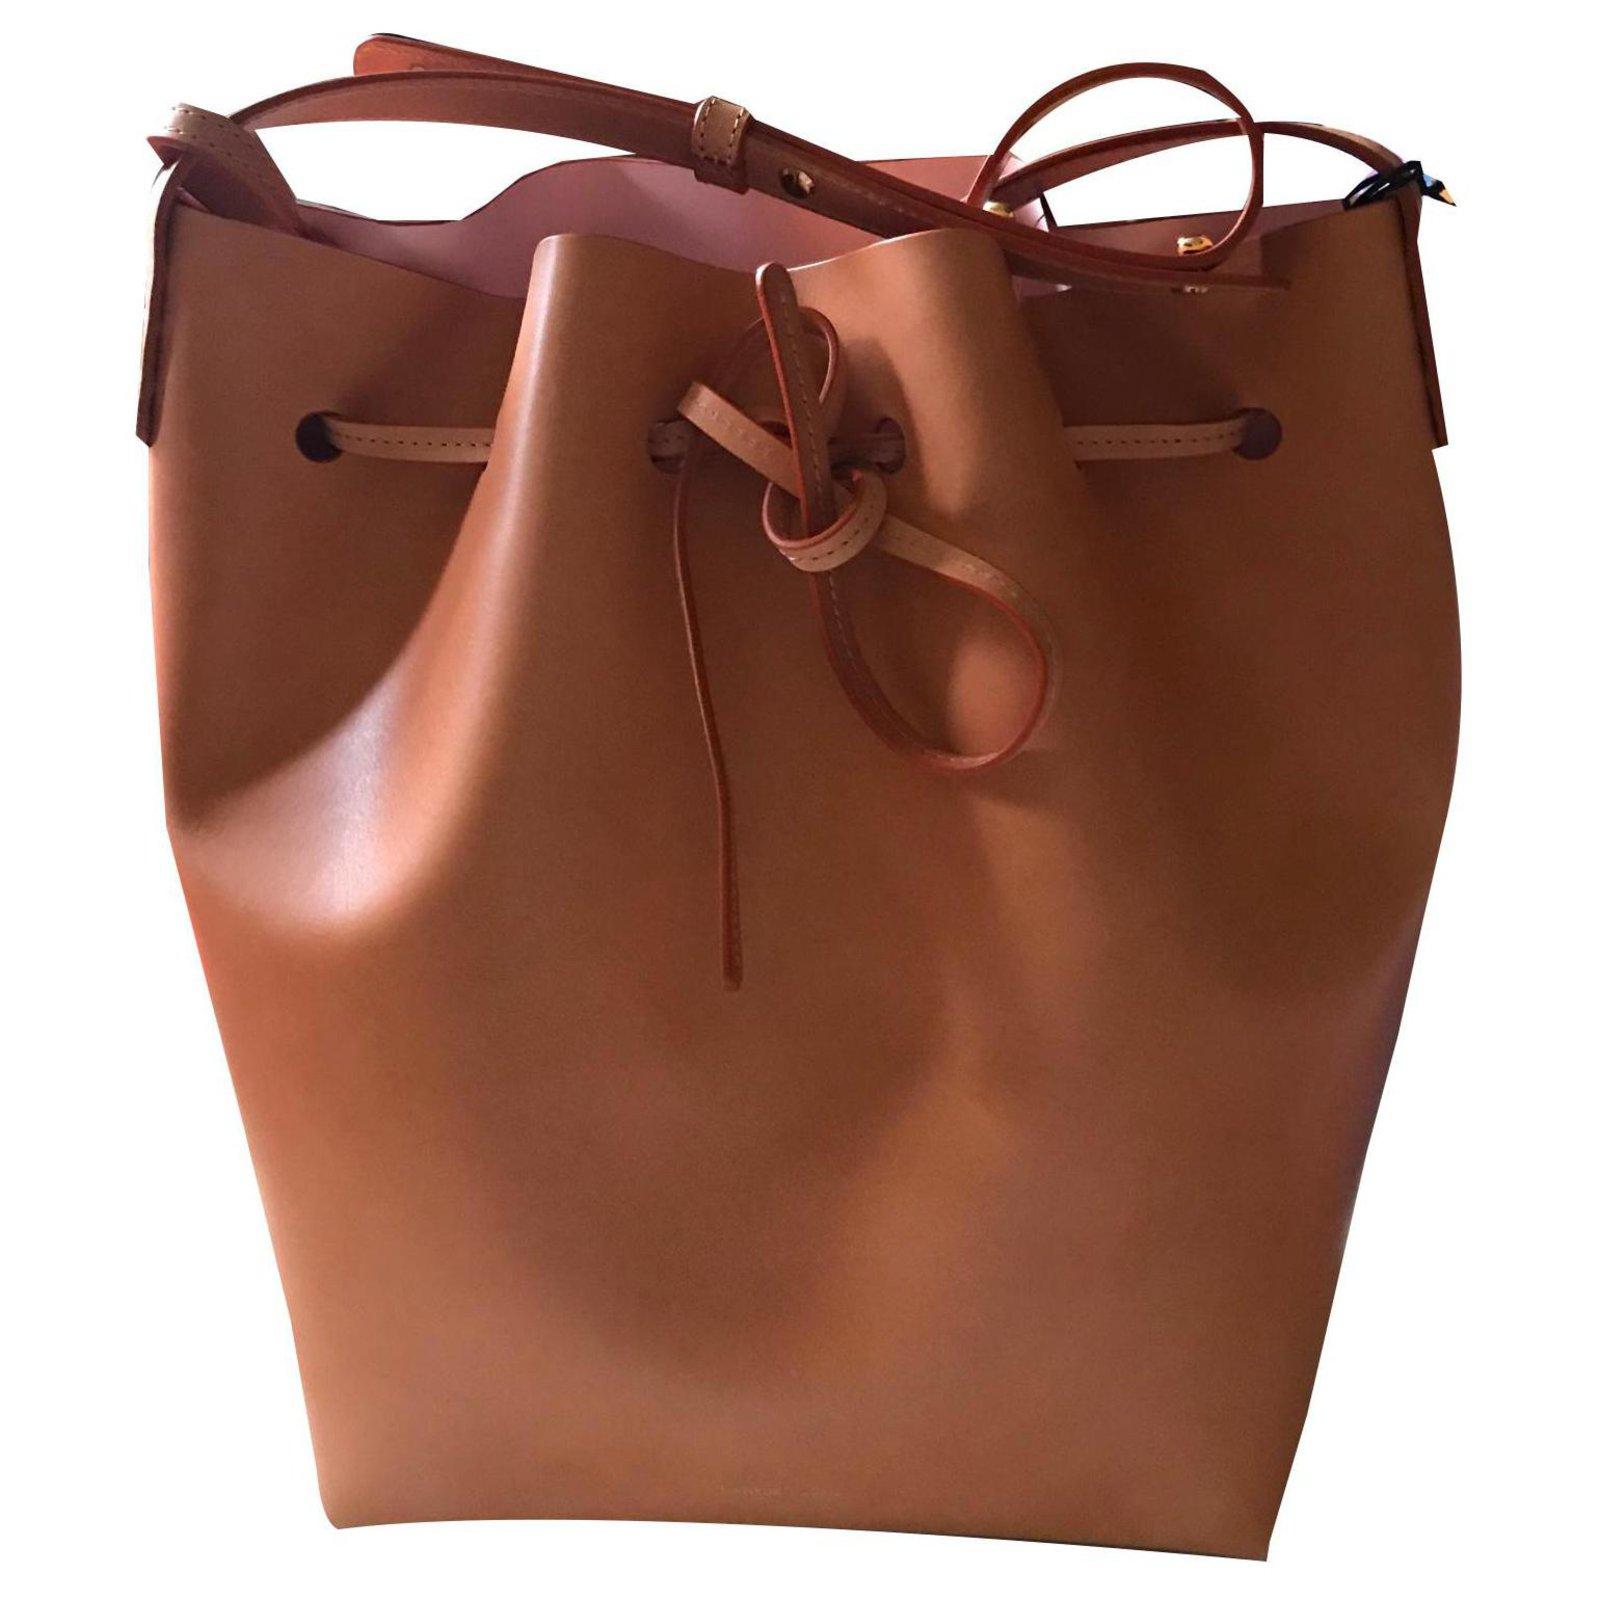 Mansur Gavriel Bucket Bucket Bag Handbags Leather Beige Ref 144343 Joli Closet